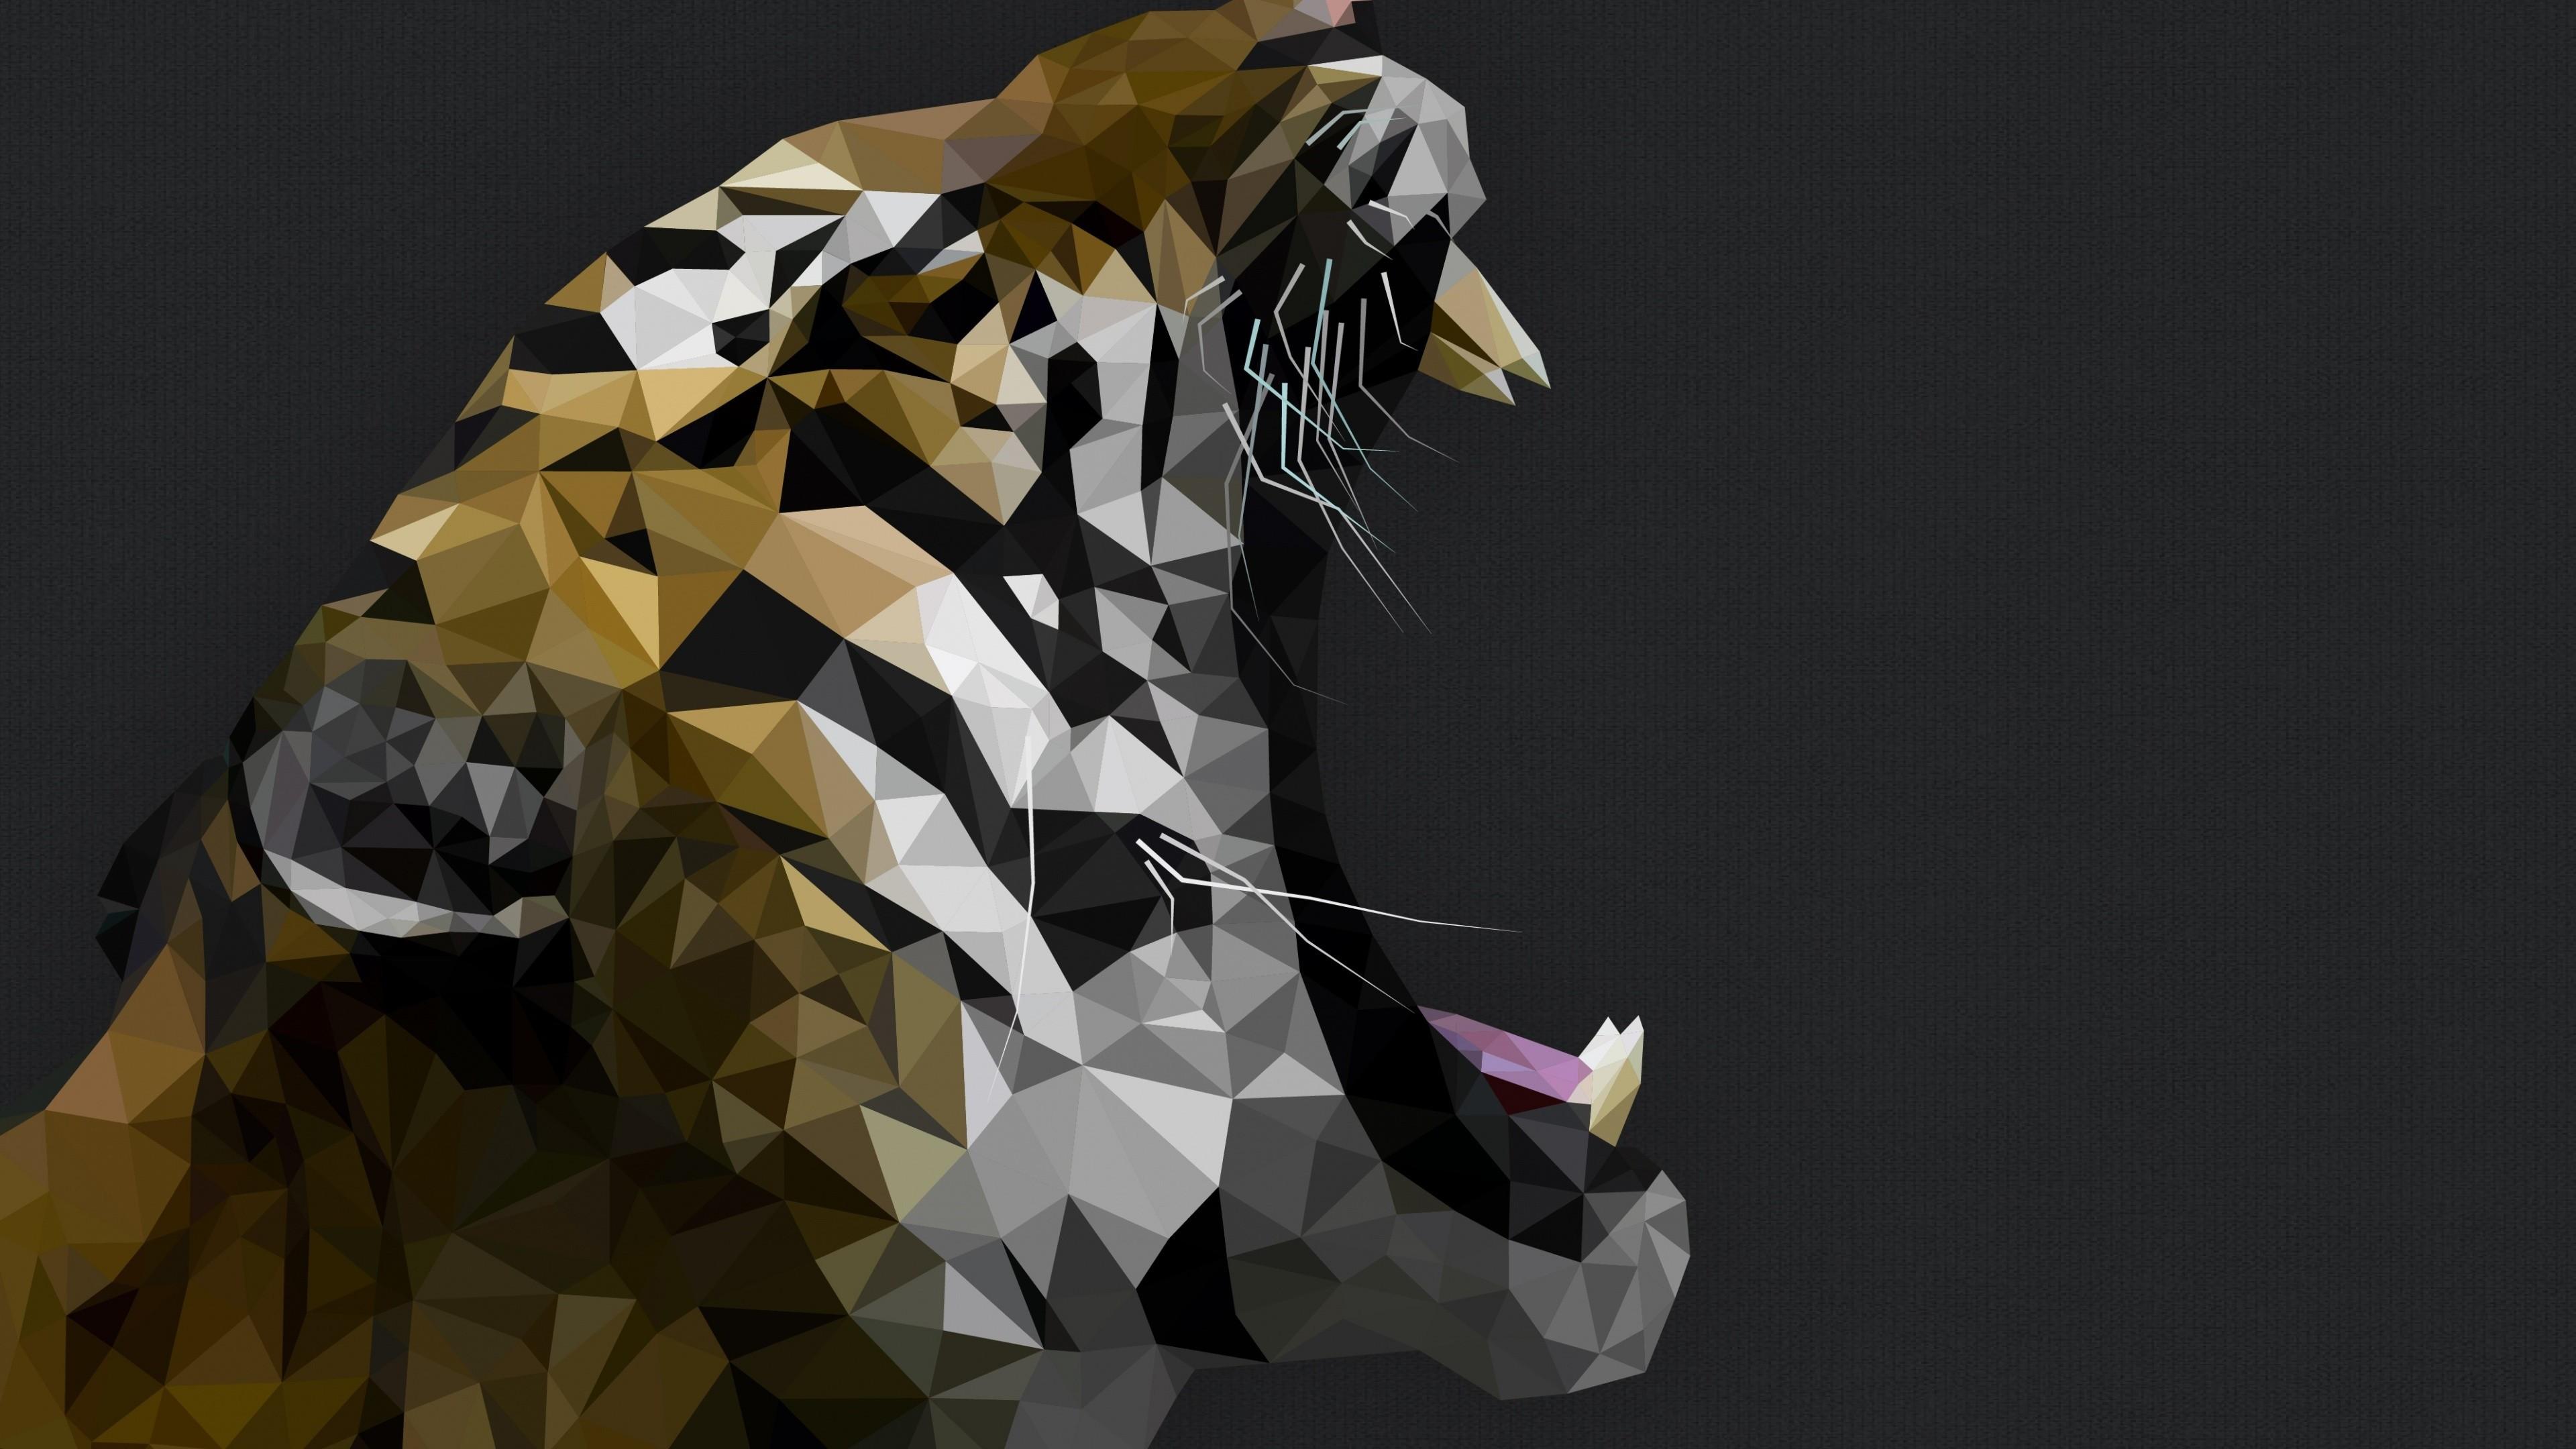 tiger digital art 1540748185 - Tiger Digital Art - tiger wallpapers, digital art wallpapers, artist wallpapers, animals wallpapers